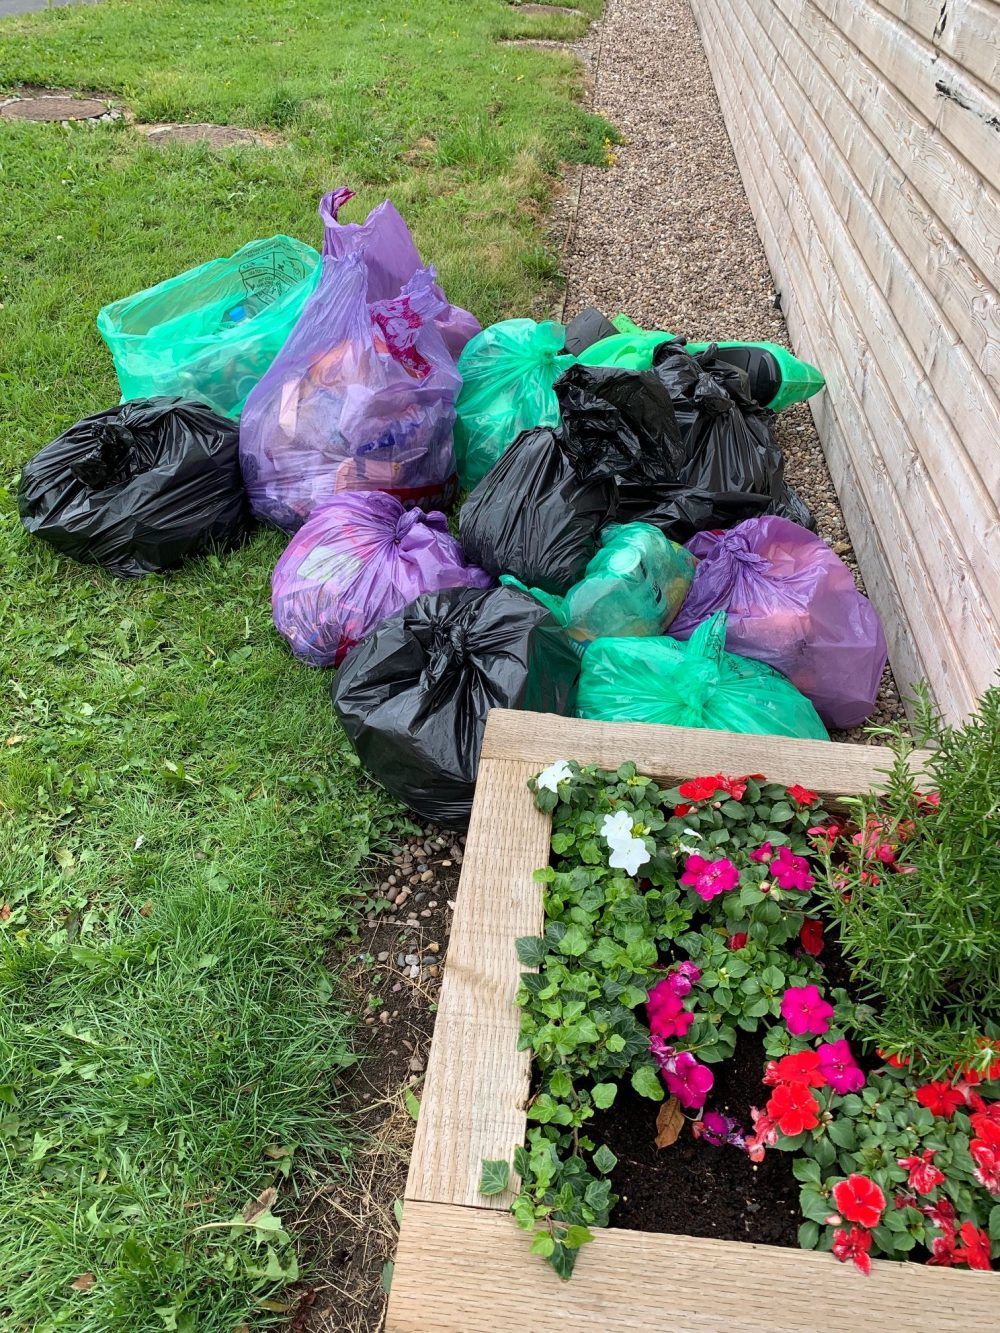 Bags of Litter